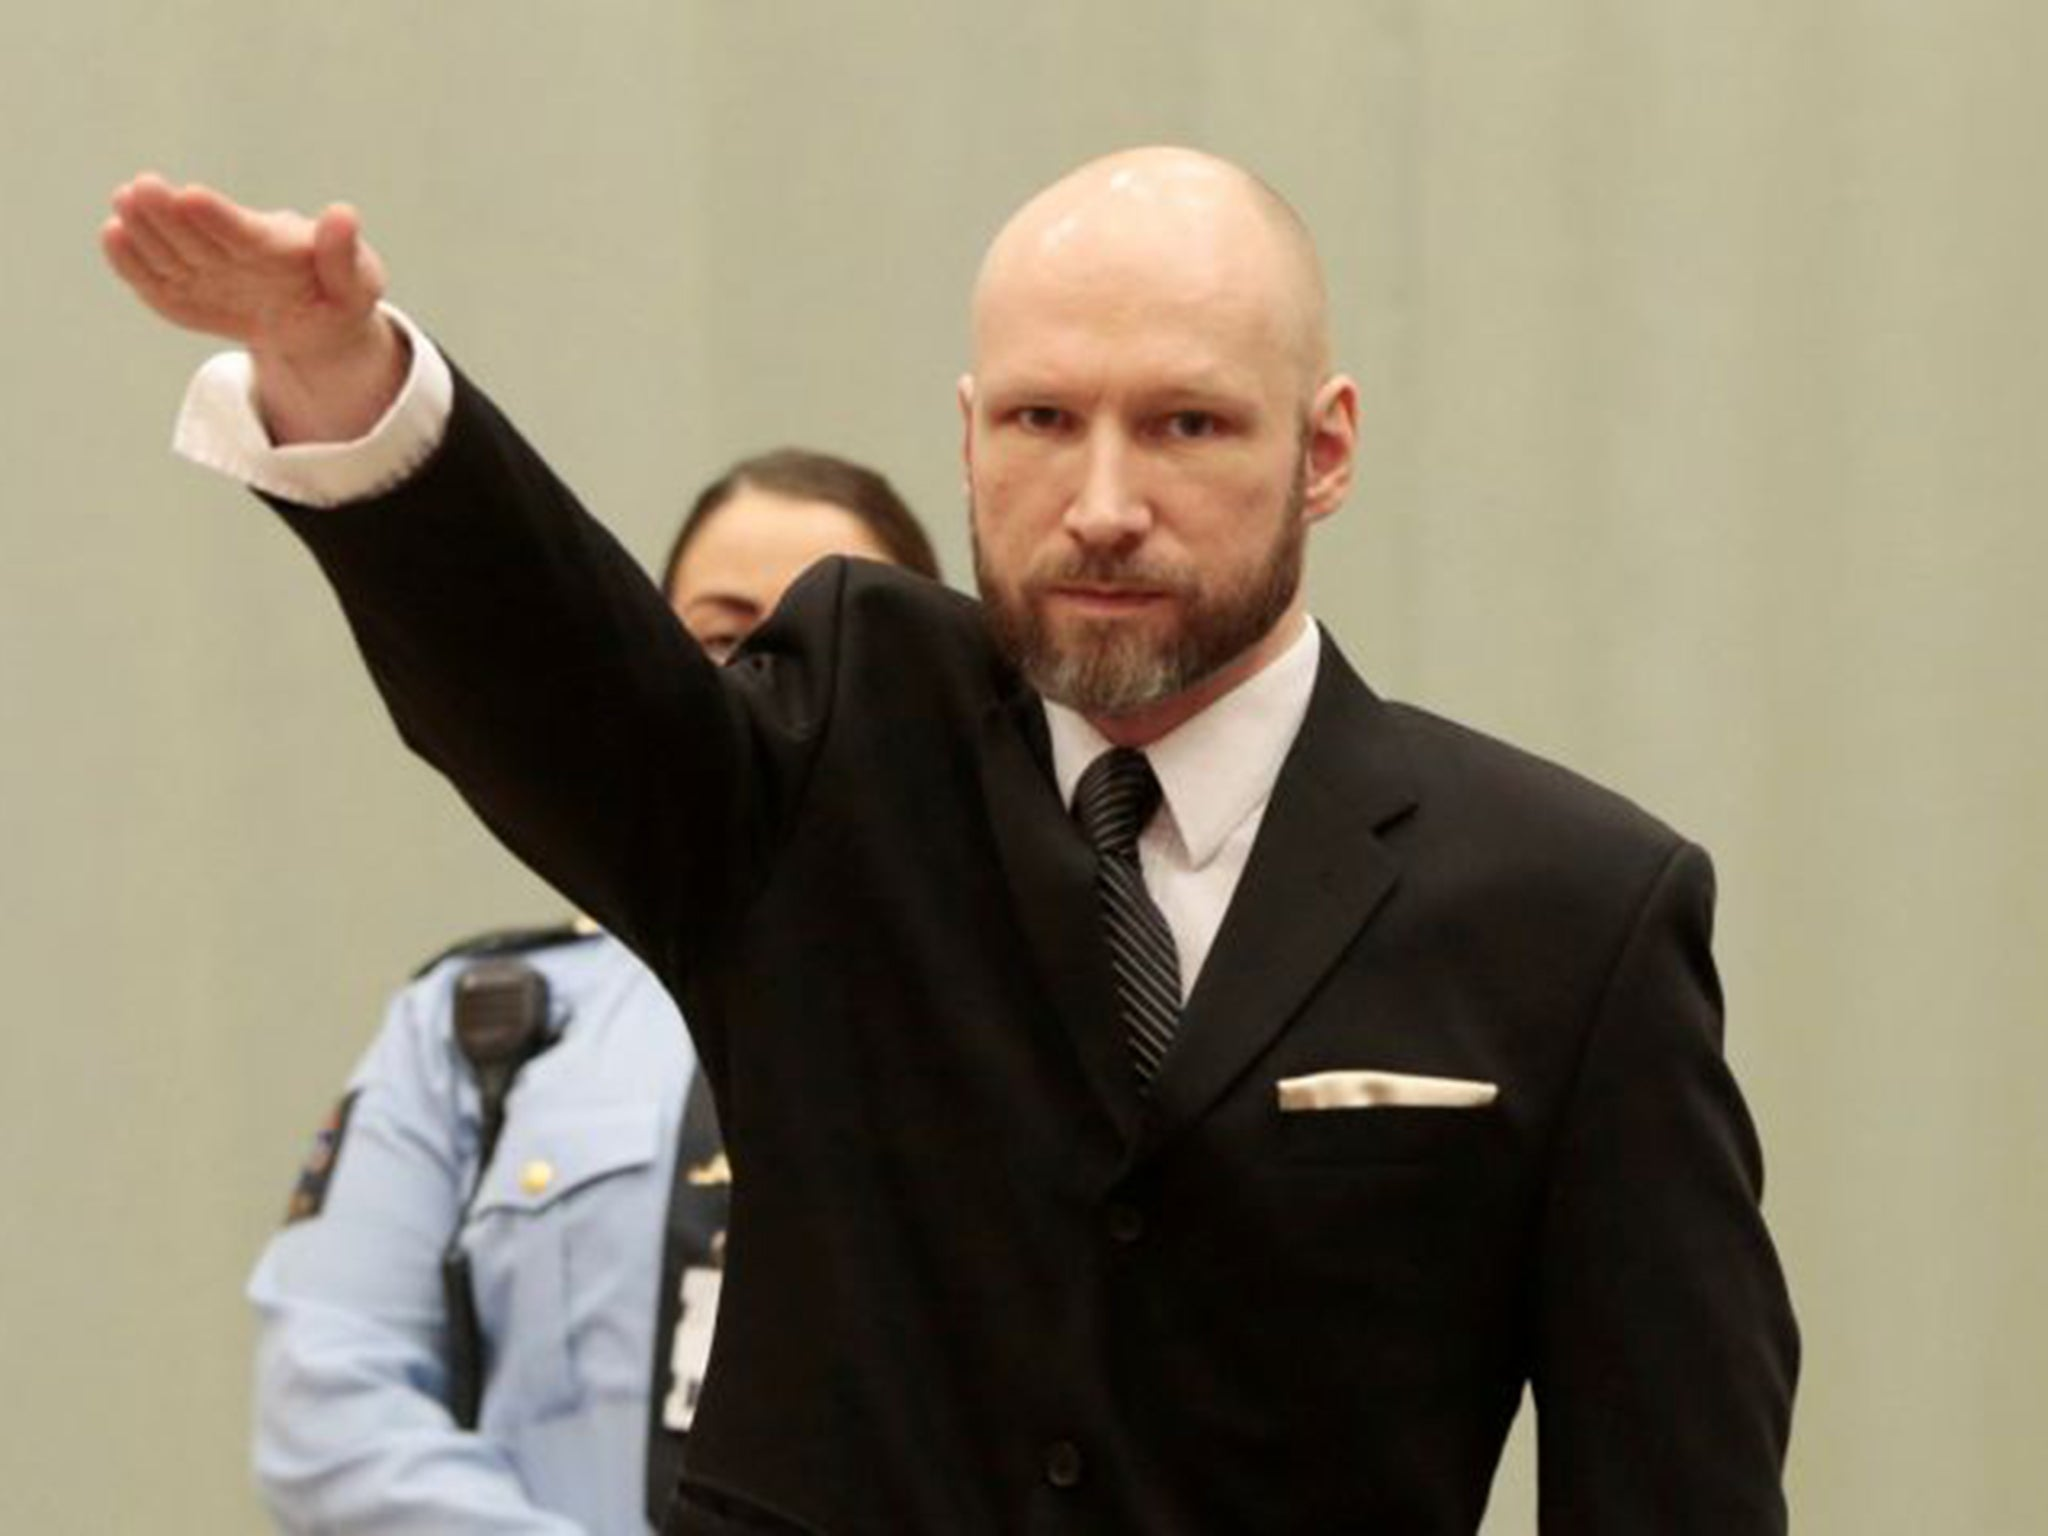 Anders Breivik, Norwegian shooter: biography, life in prison 27